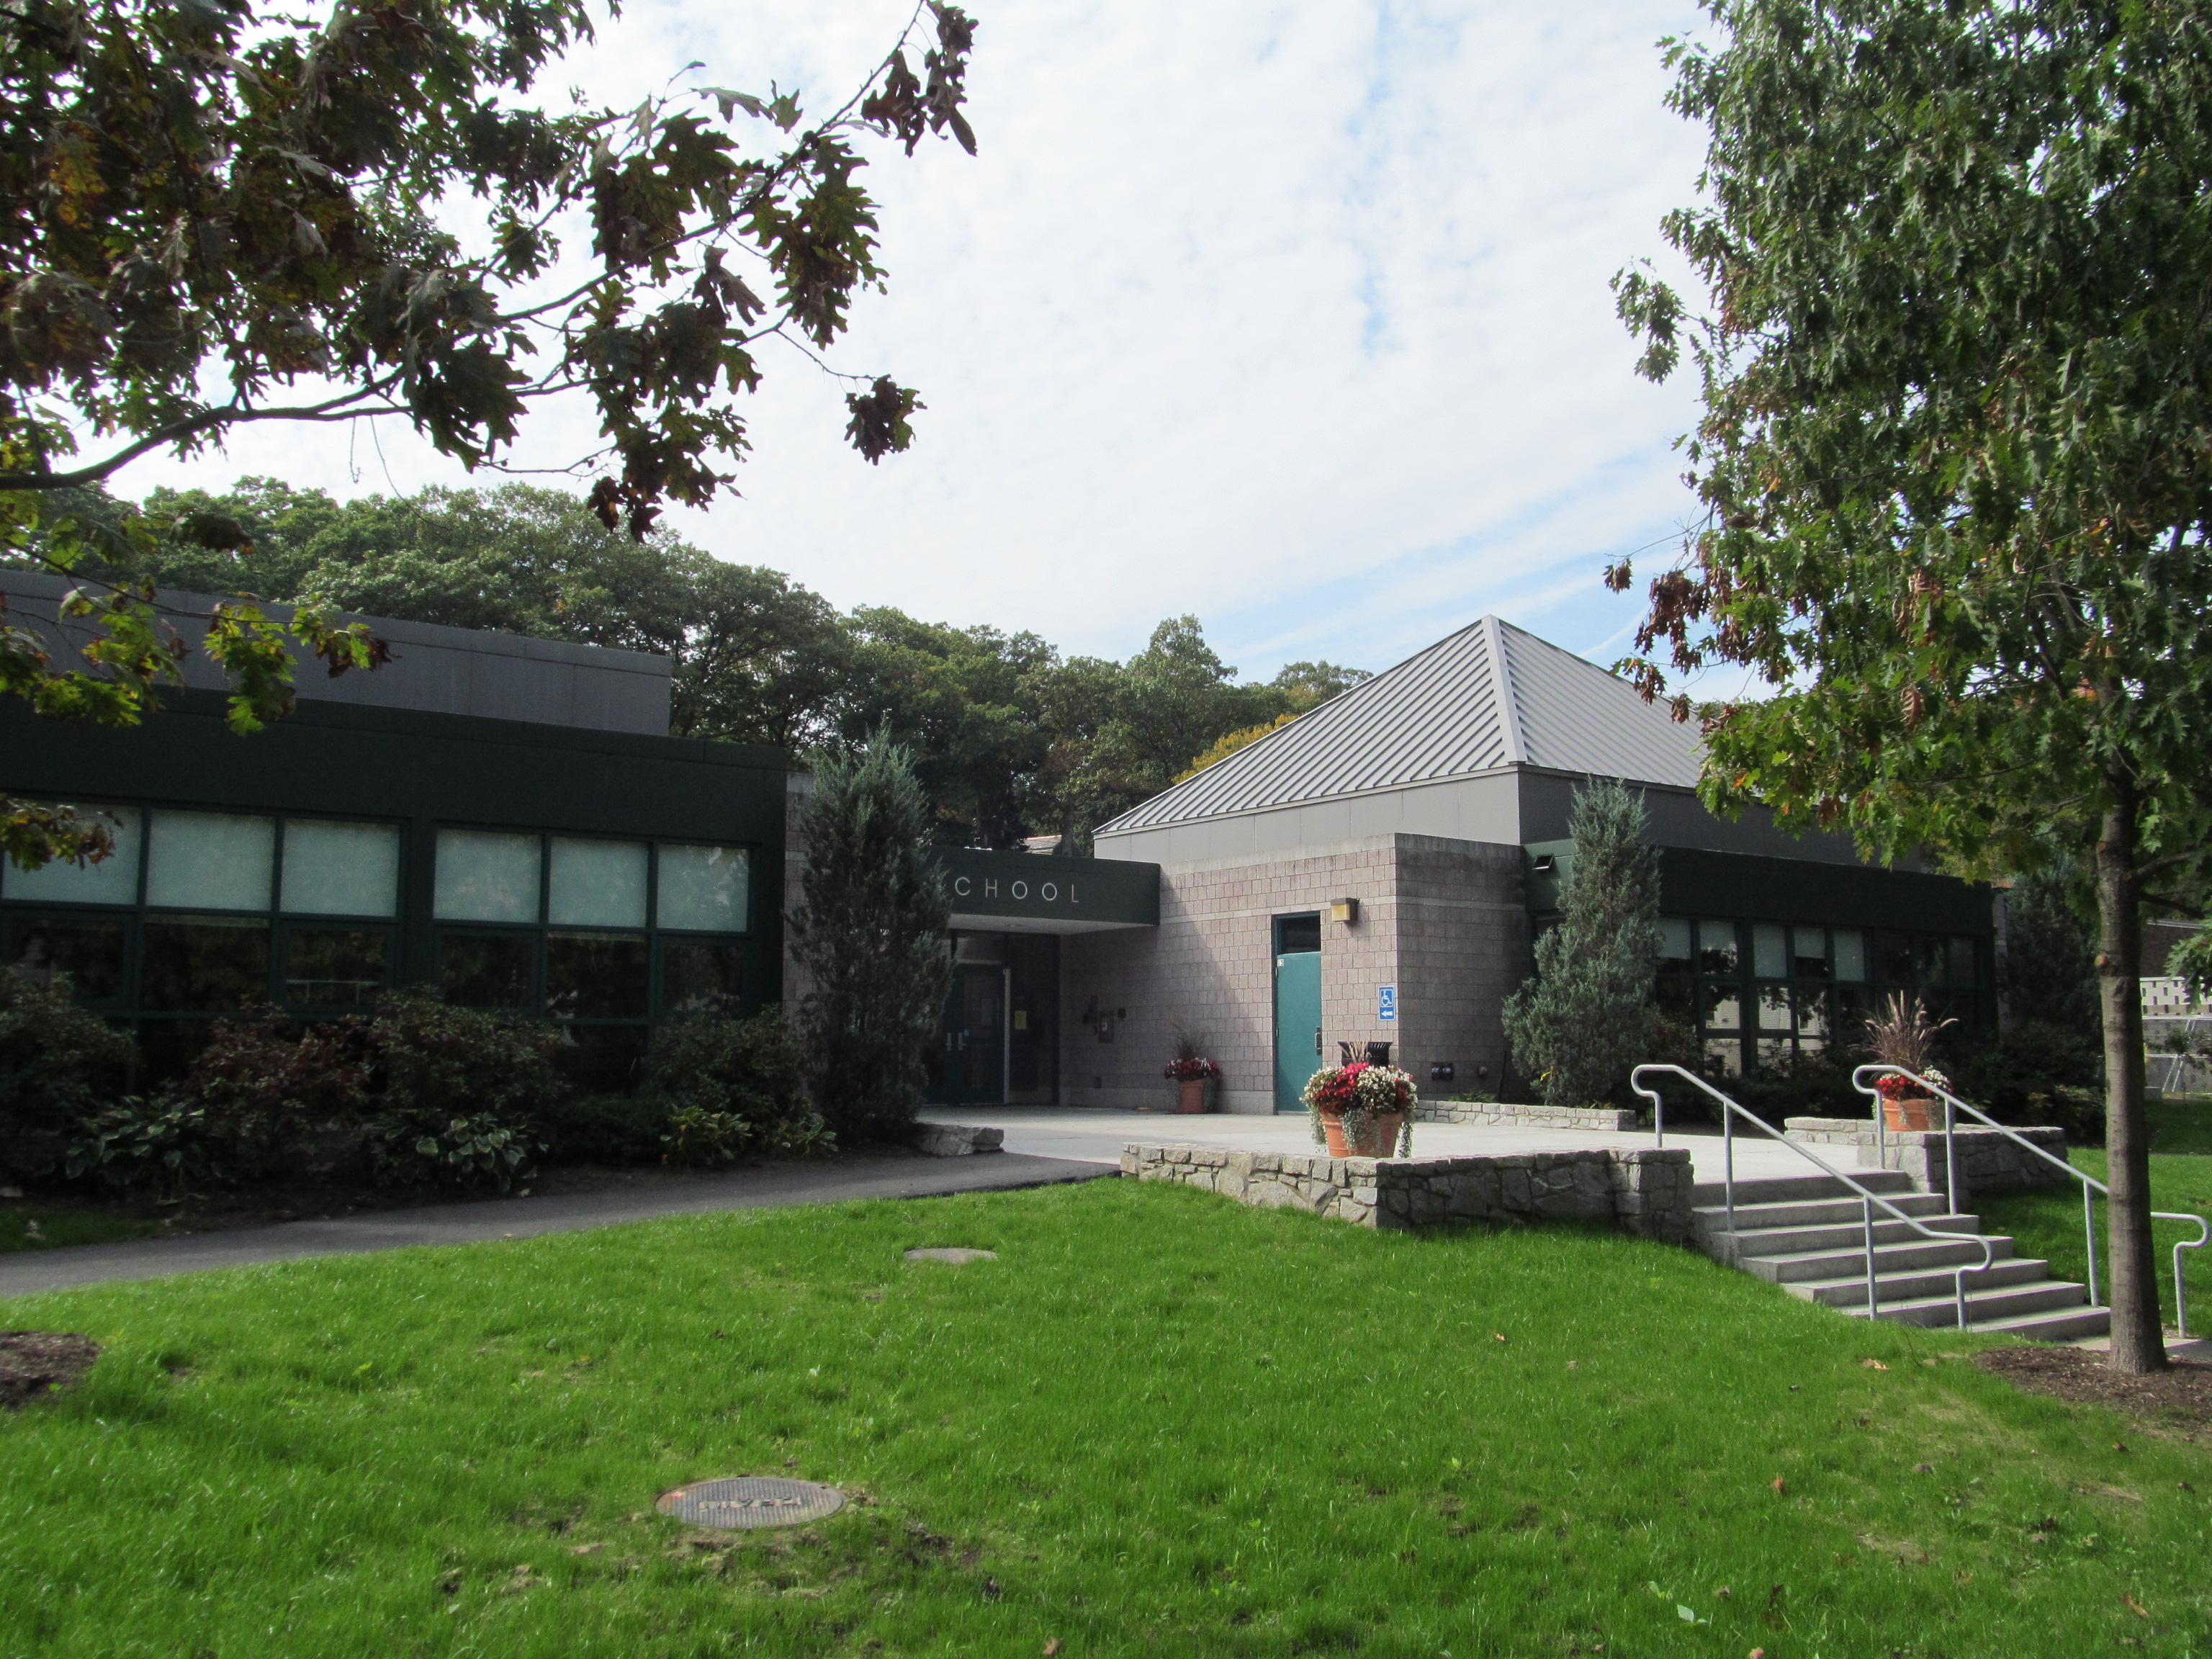 Heath School